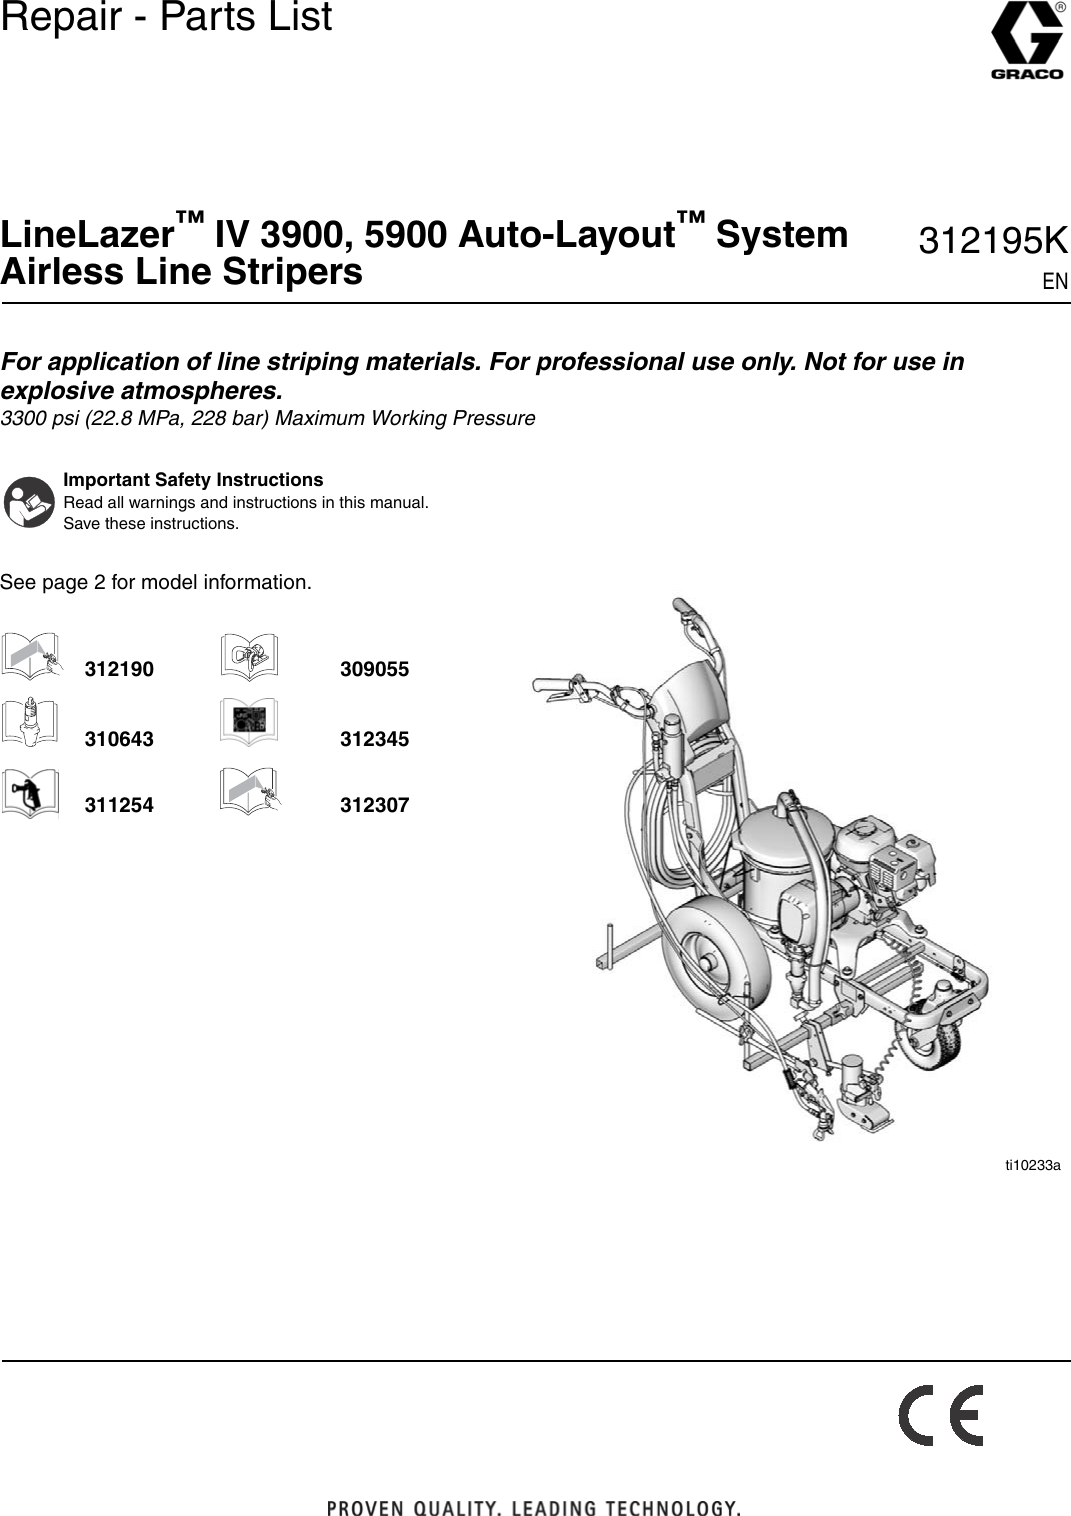 Polaris 3900 Sport Replacement Parts Manual Guide